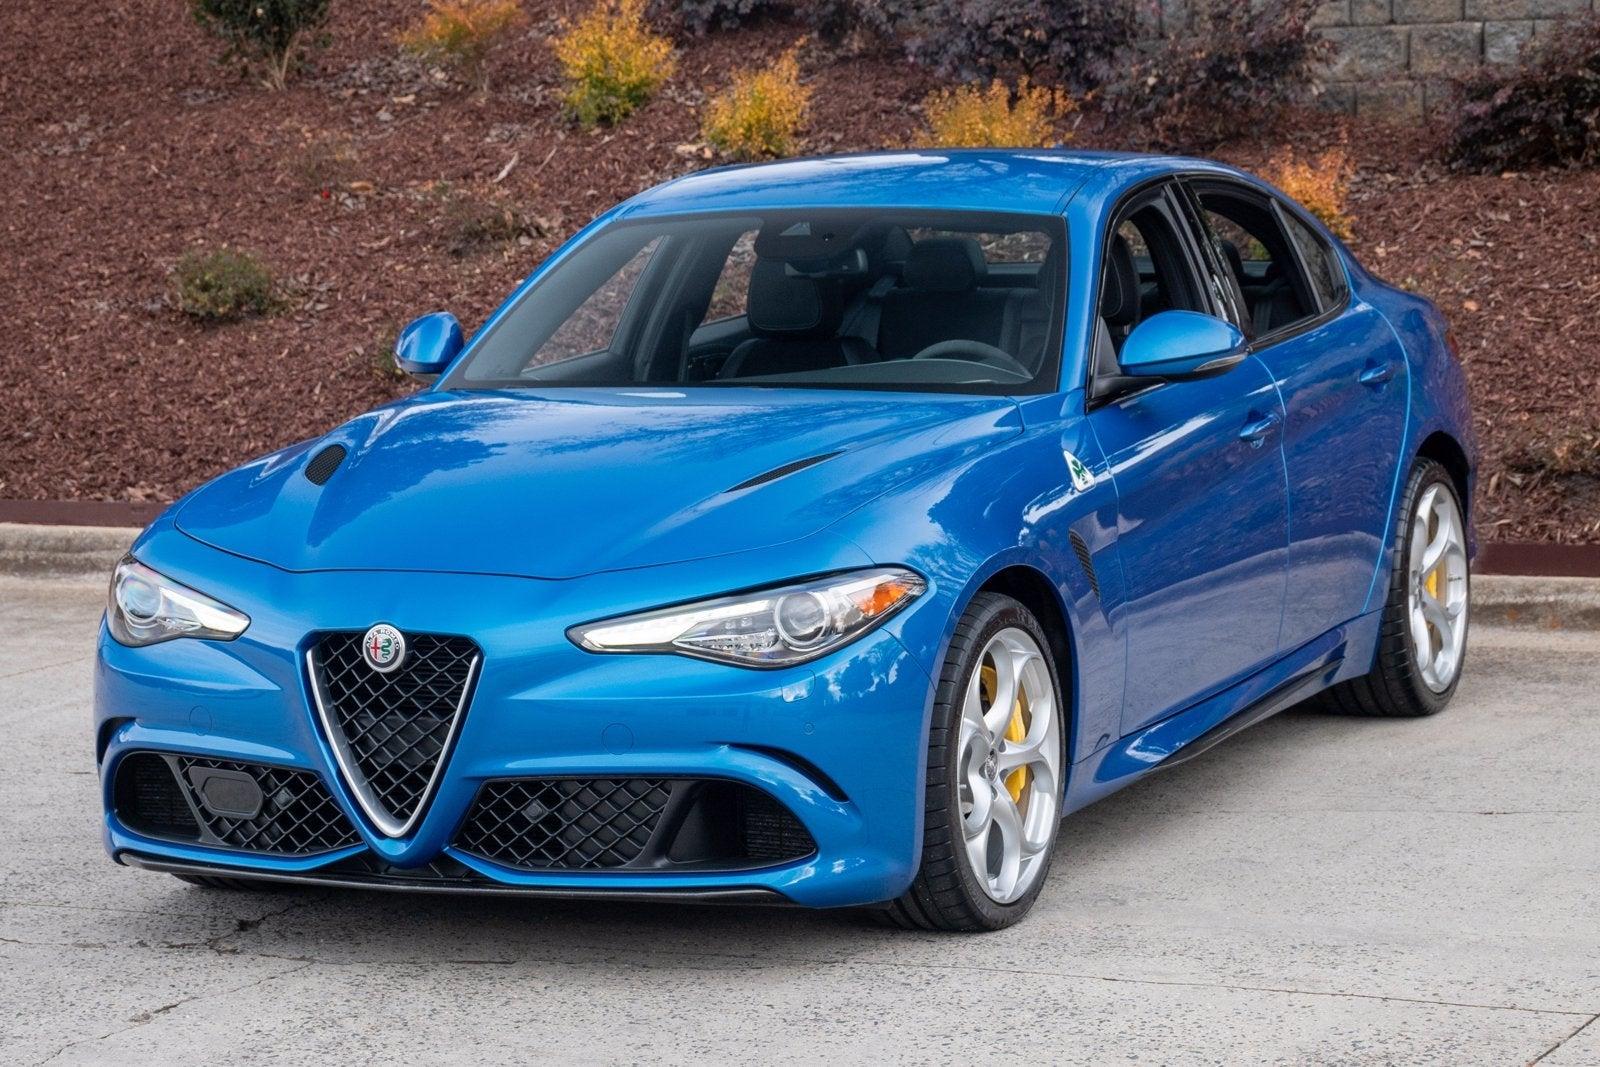 2019 Alfa Romeo Giulia Quadrifoglio Charlotte Nc Cornelius